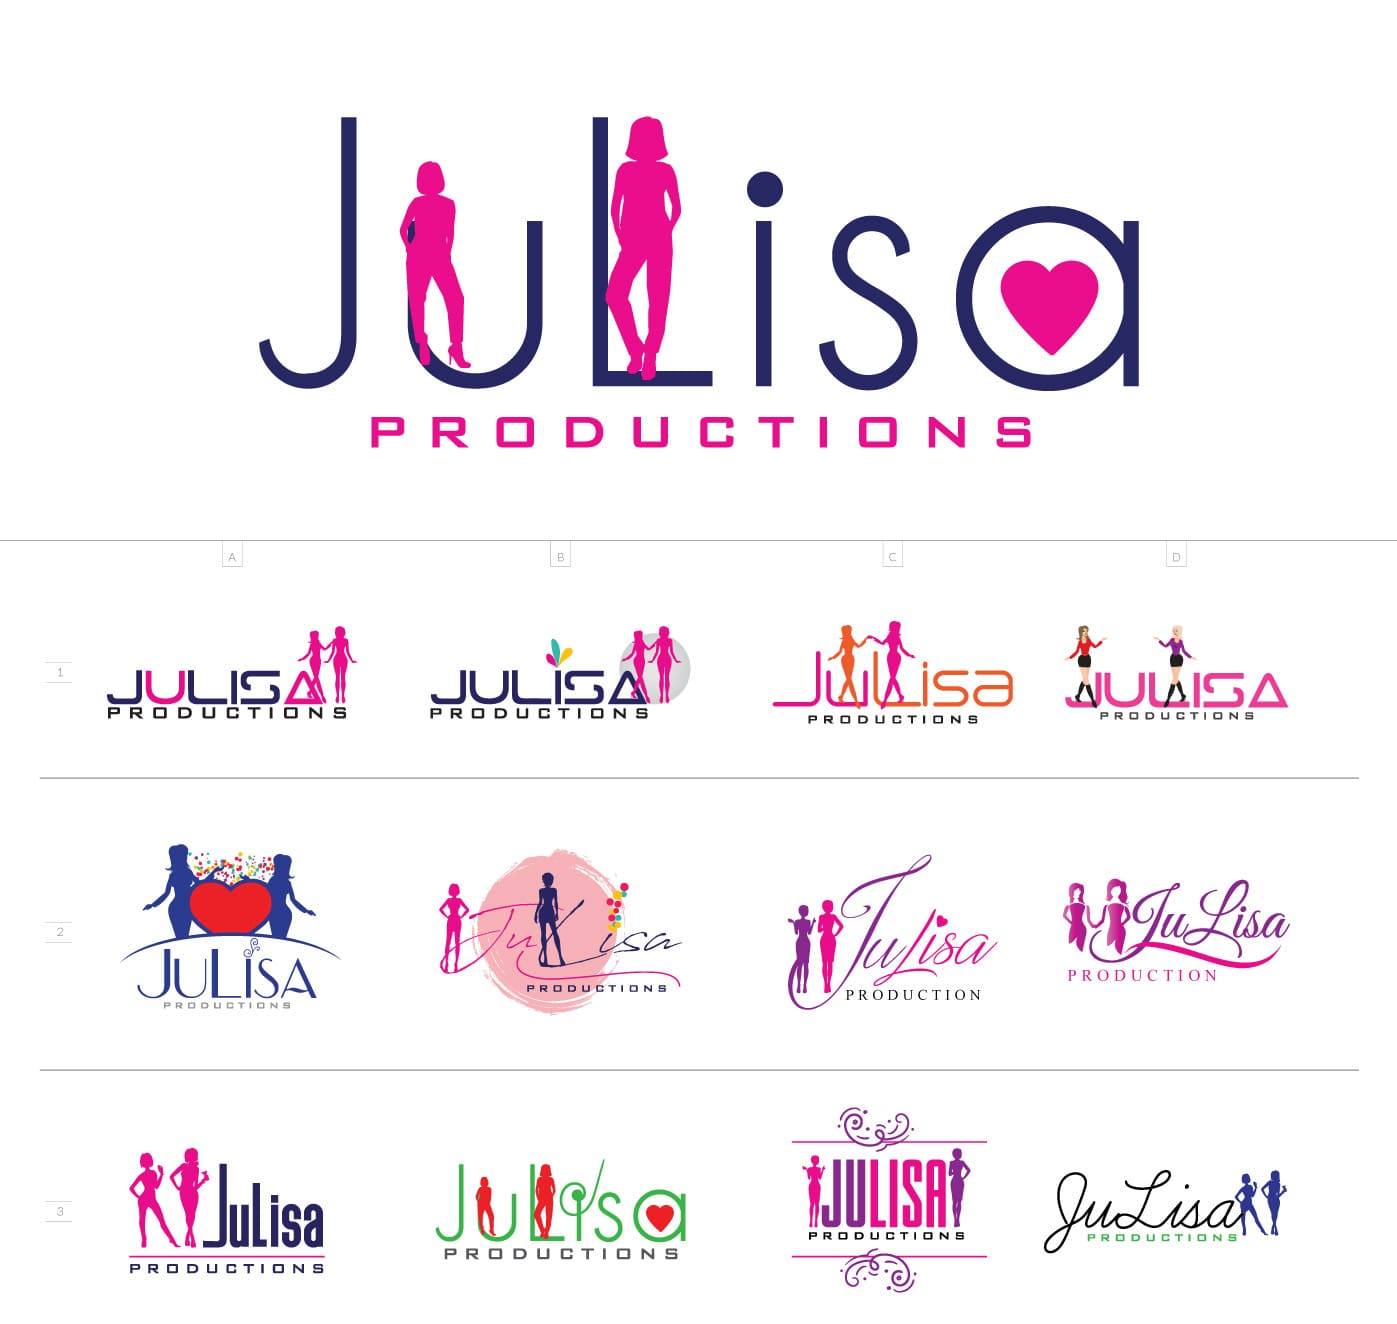 Julisa Production Logo Design Options